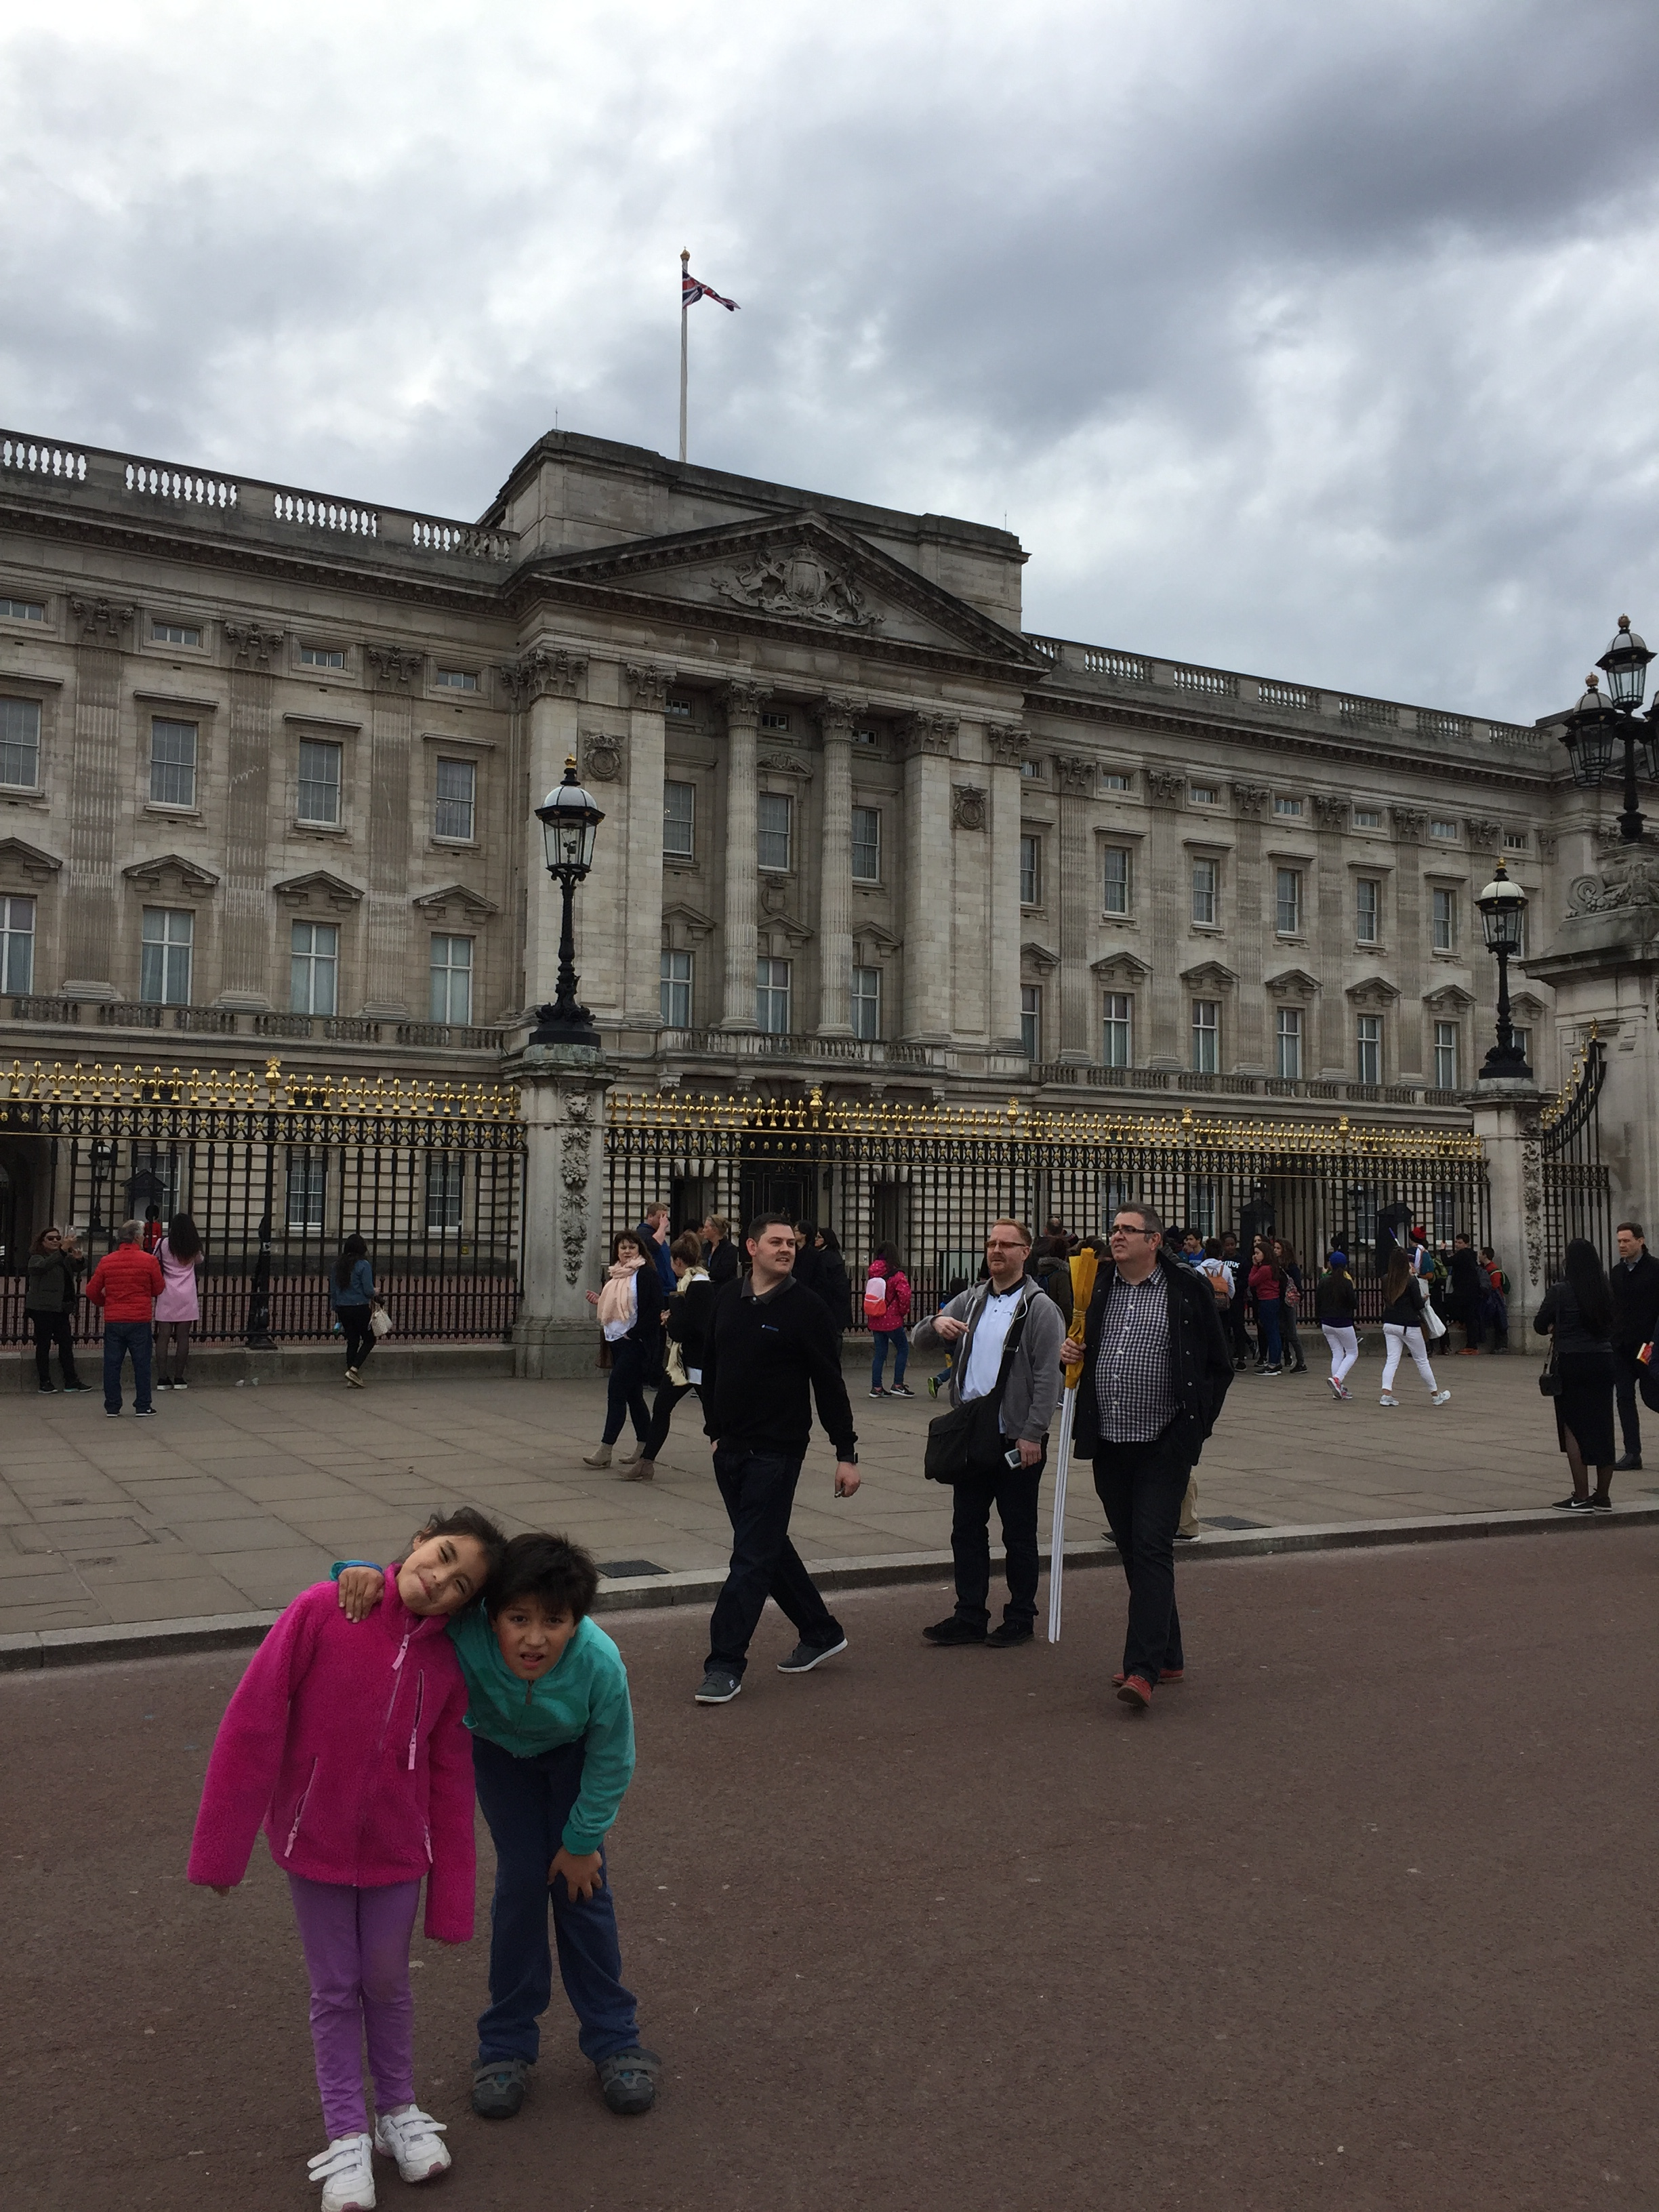 Palacio de Buckingham, Londres | Mi blog de aventuras | 2017